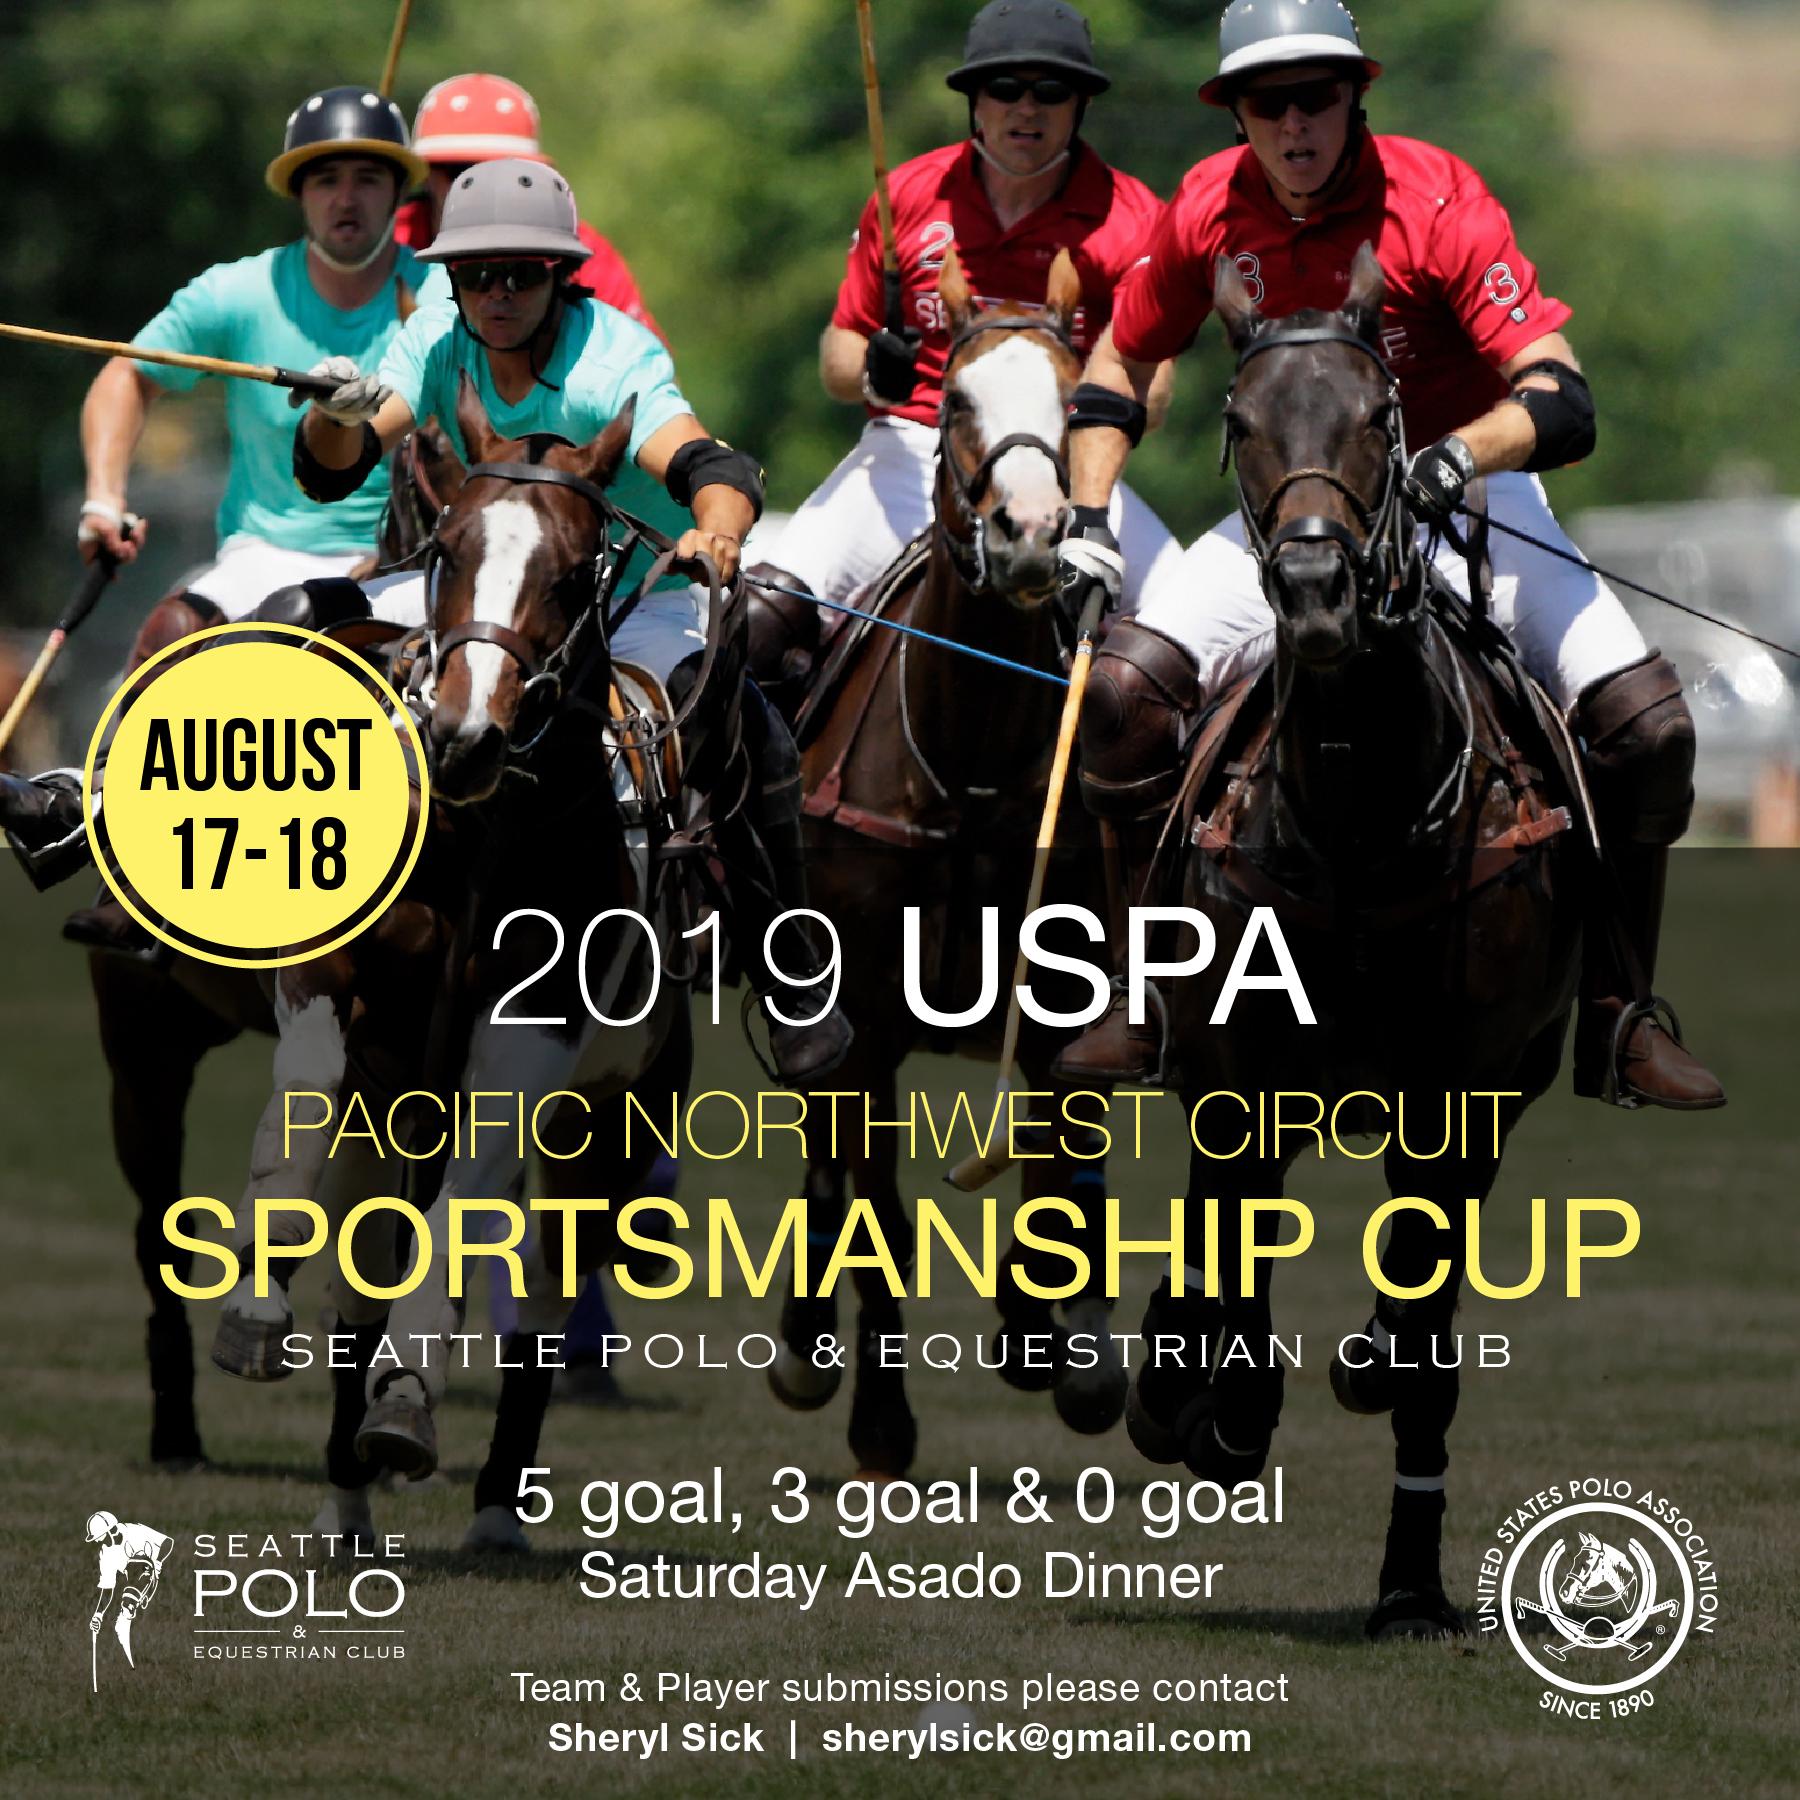 USPA Sportsmanship Cup 2019.jpg